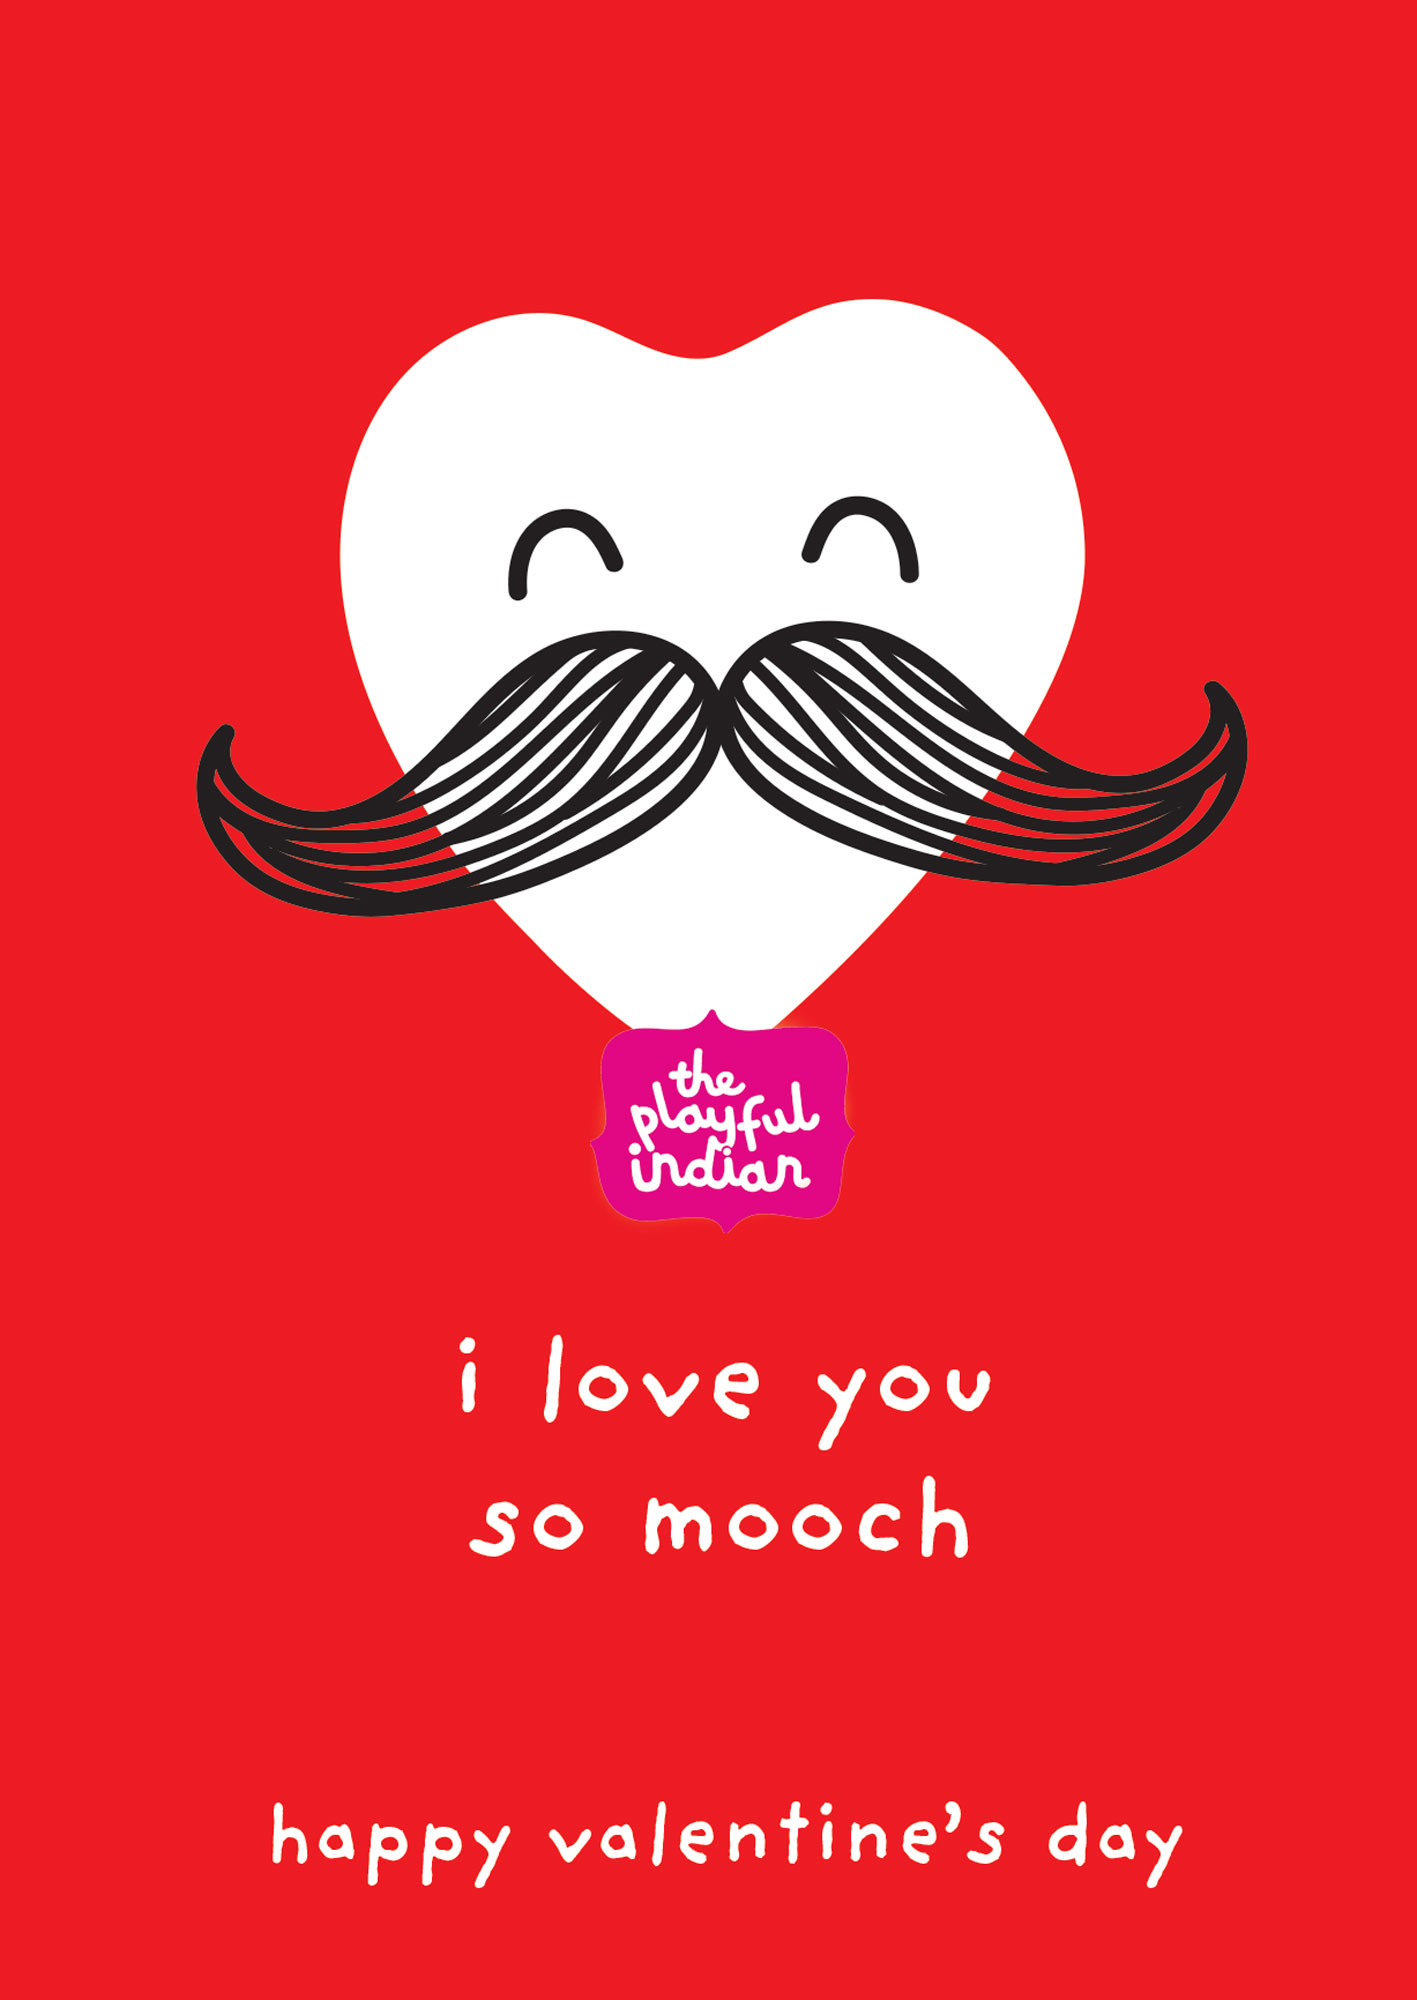 i love you so mooch valentines greeting card